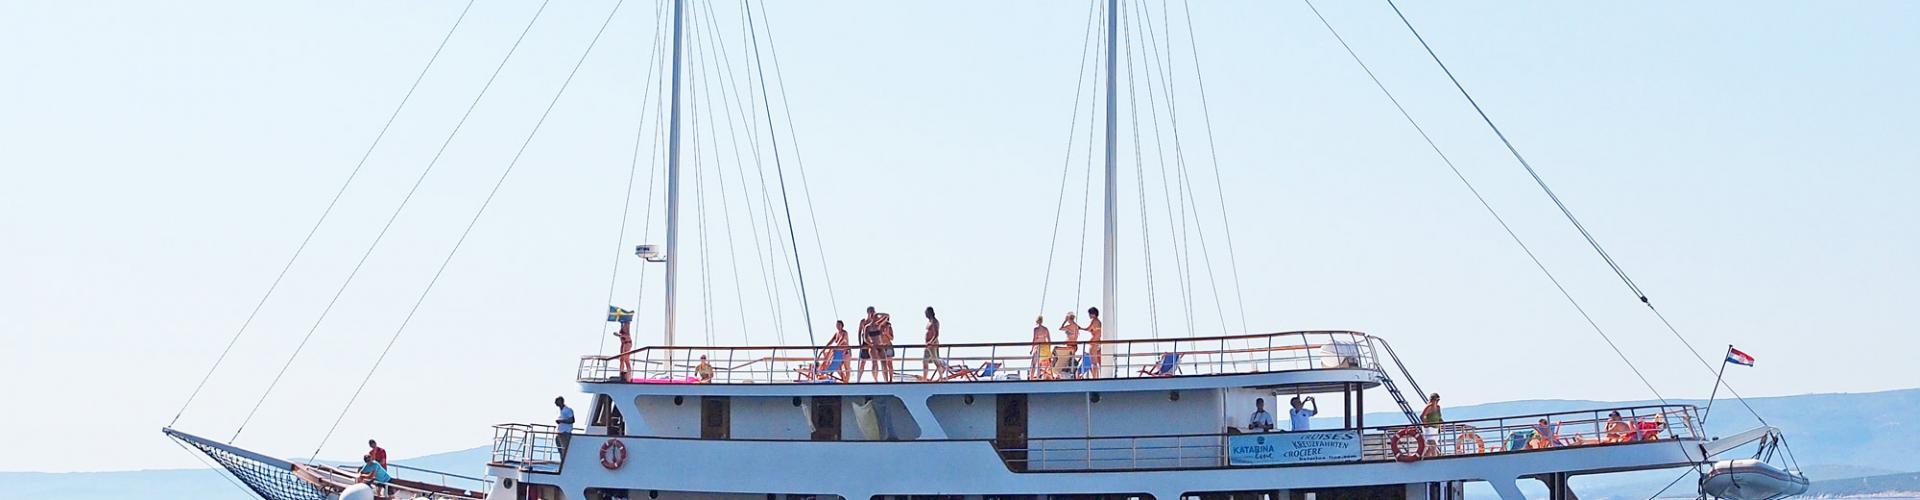 Premium cruiser MV Dionis- motor sailer